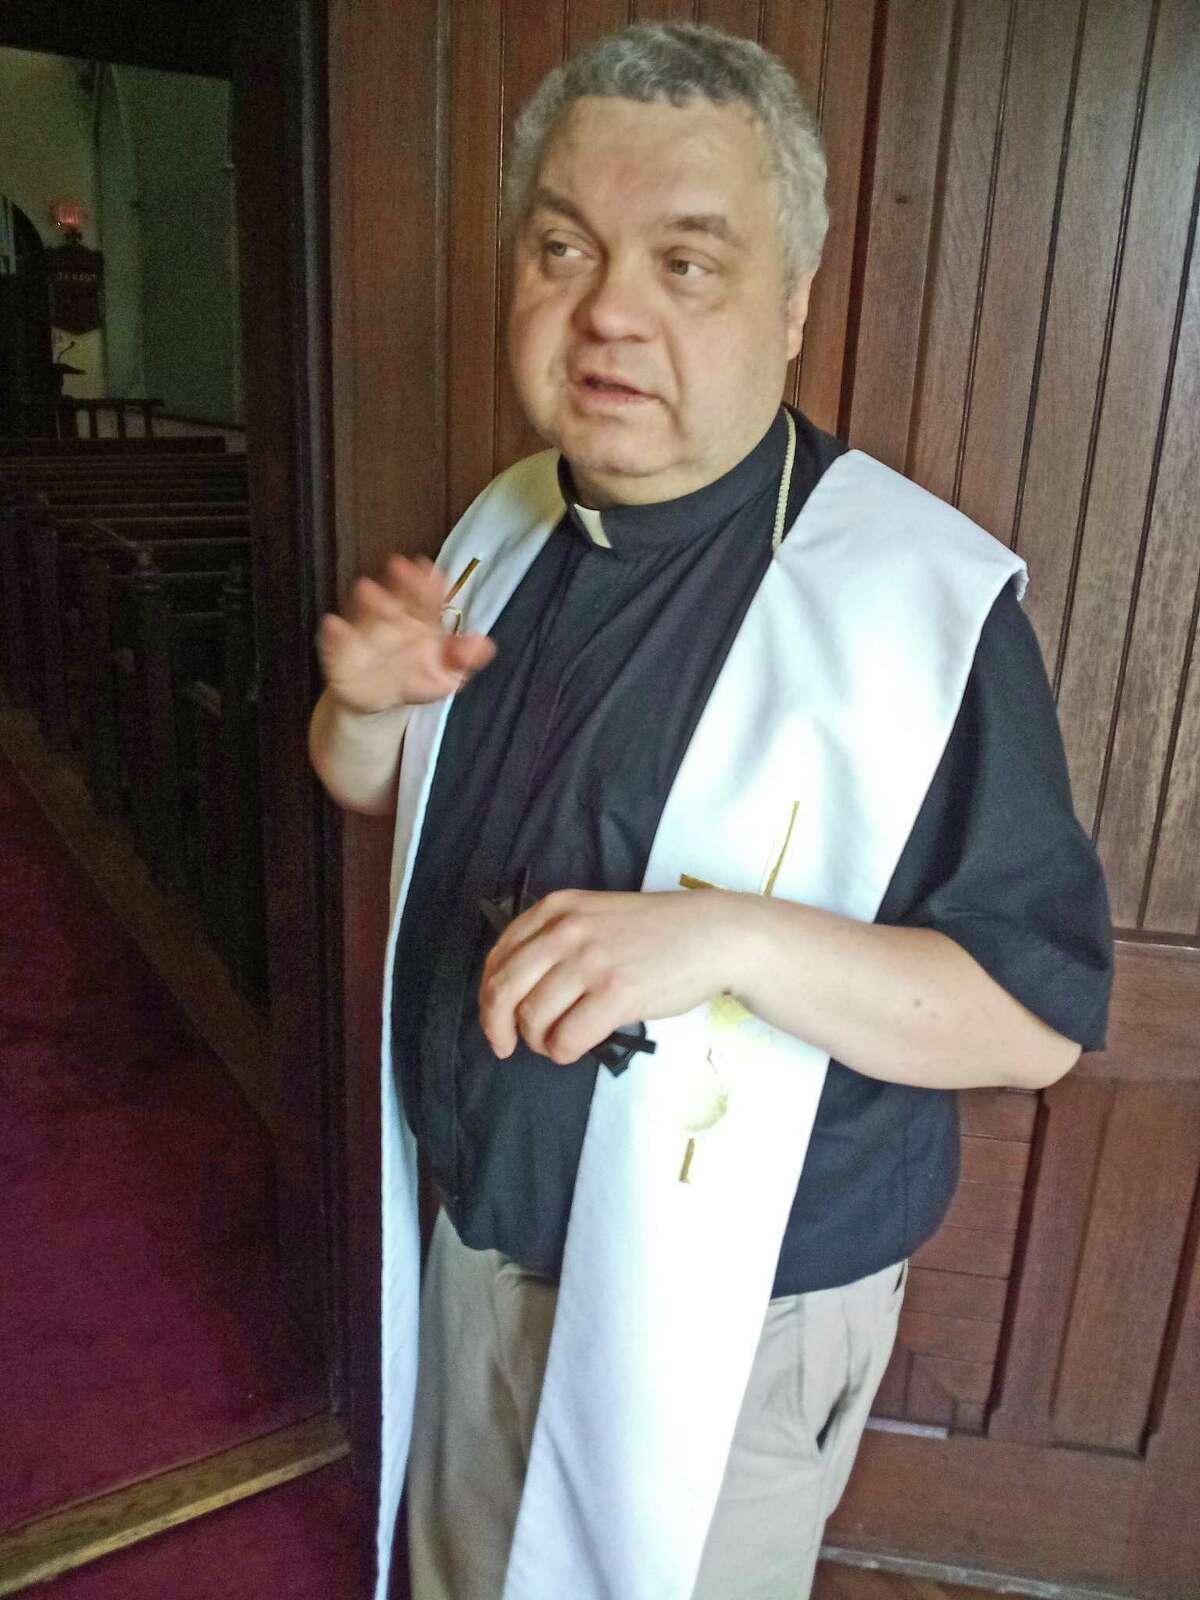 The Rev. Alex Gorecki.